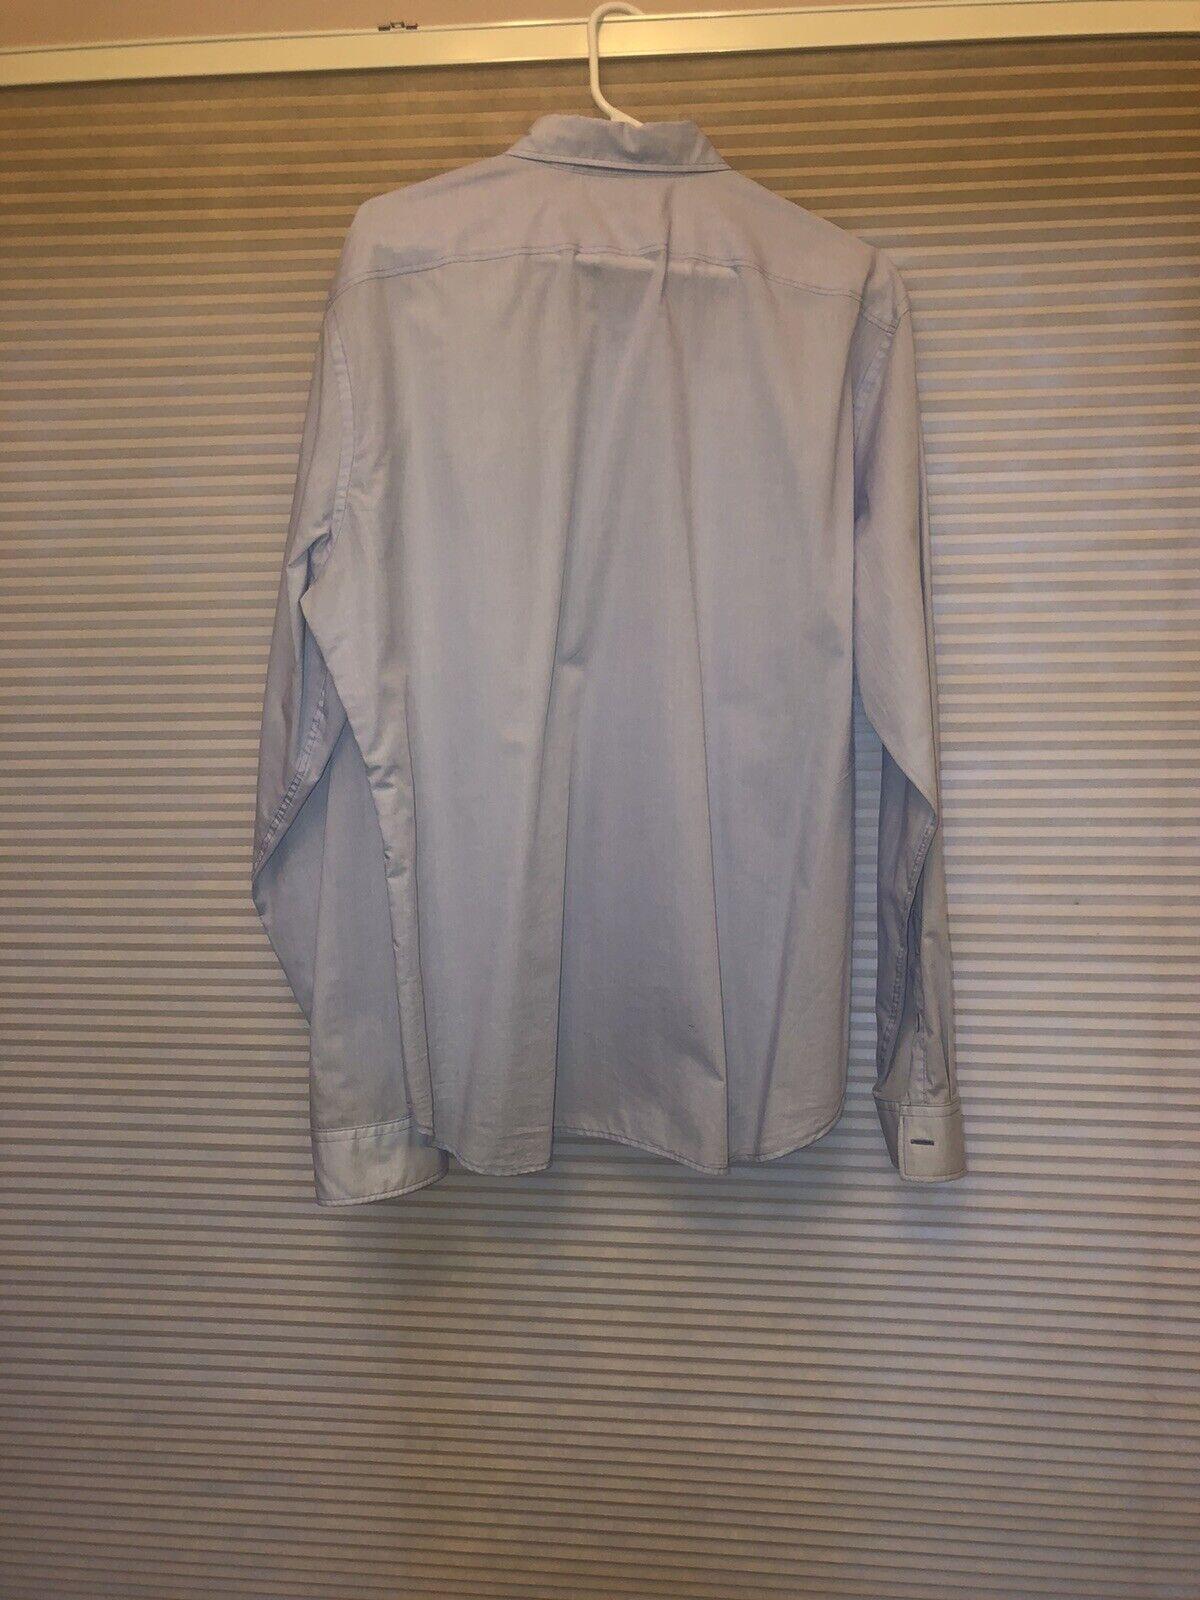 Burberry Button Up Shirt - image 3